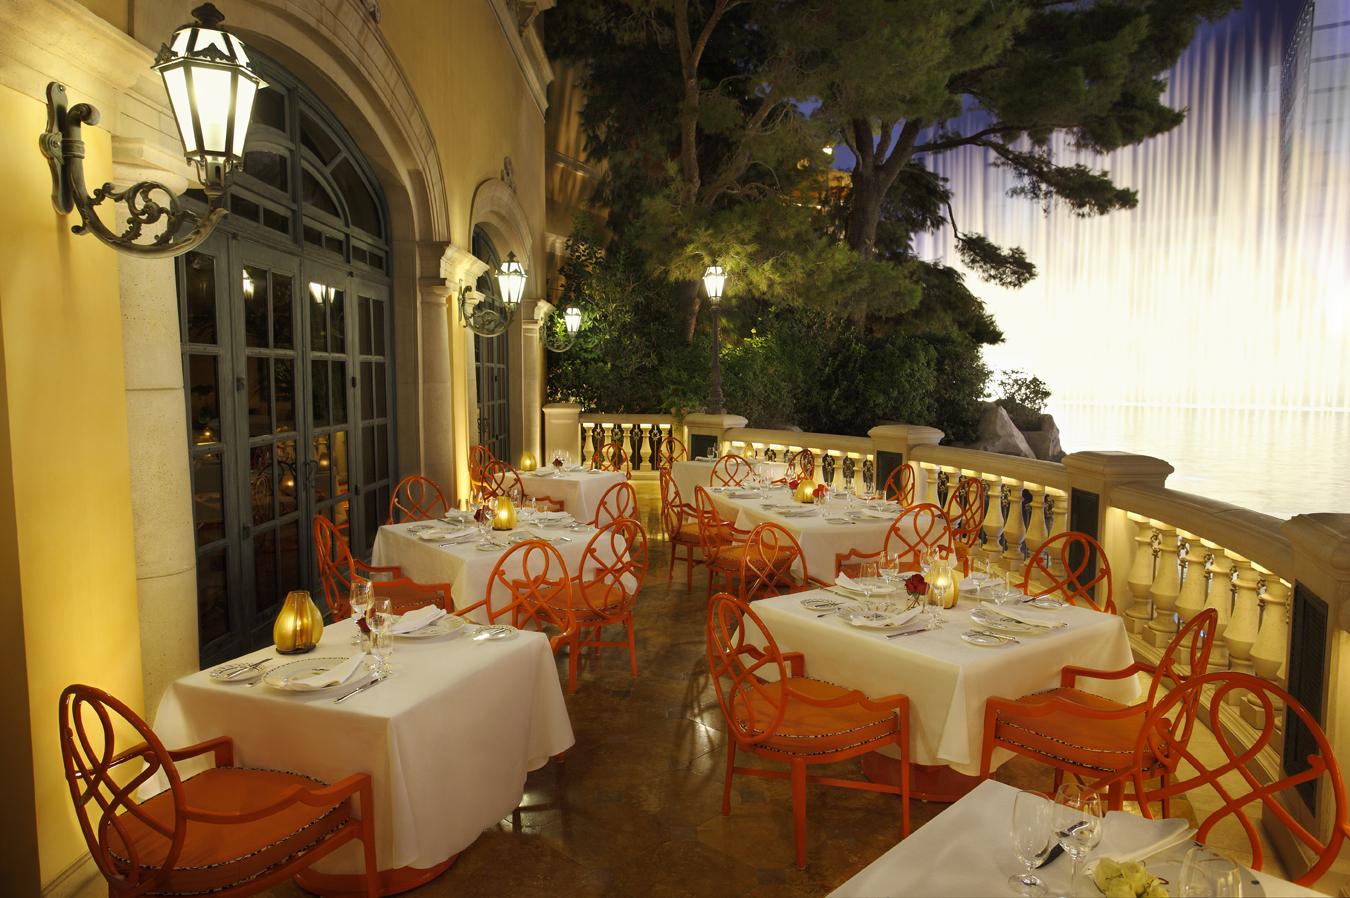 Restaurant Le Patio Saint Cyr Sur Mer